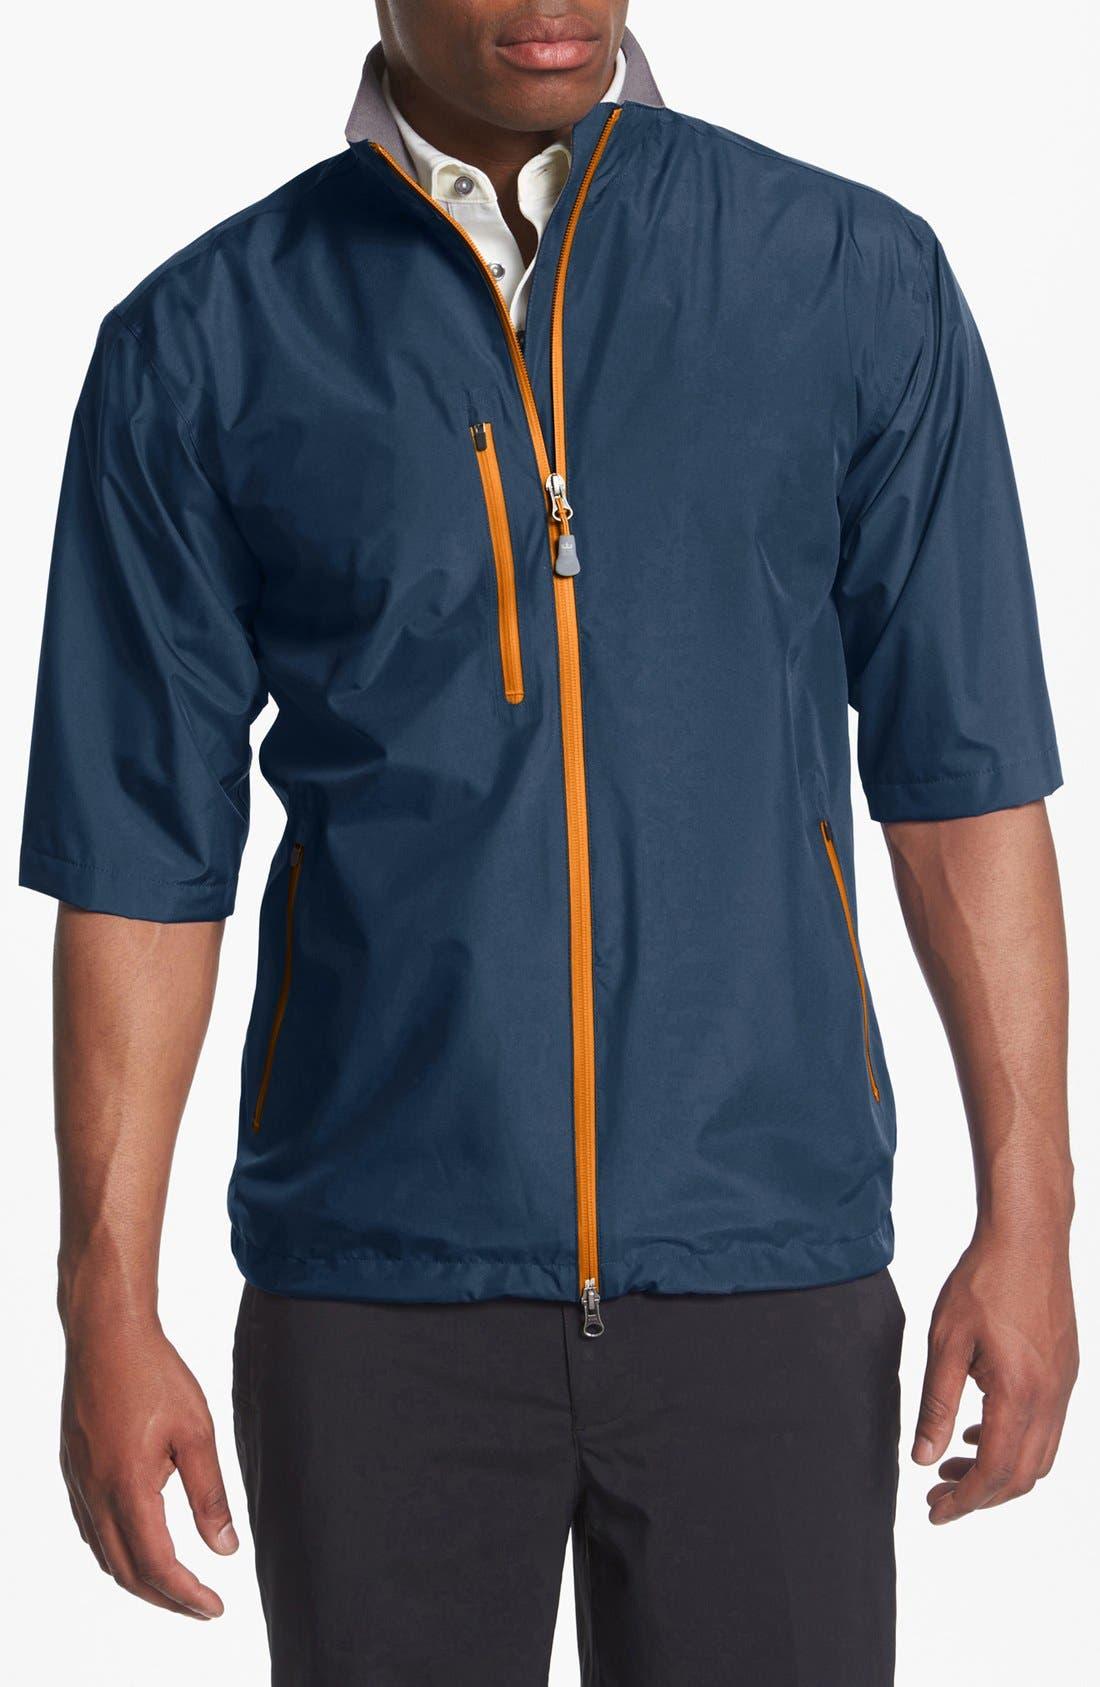 Alternate Image 1 Selected - Peter Millar 'Toronto' Short Sleeve Rain Jacket